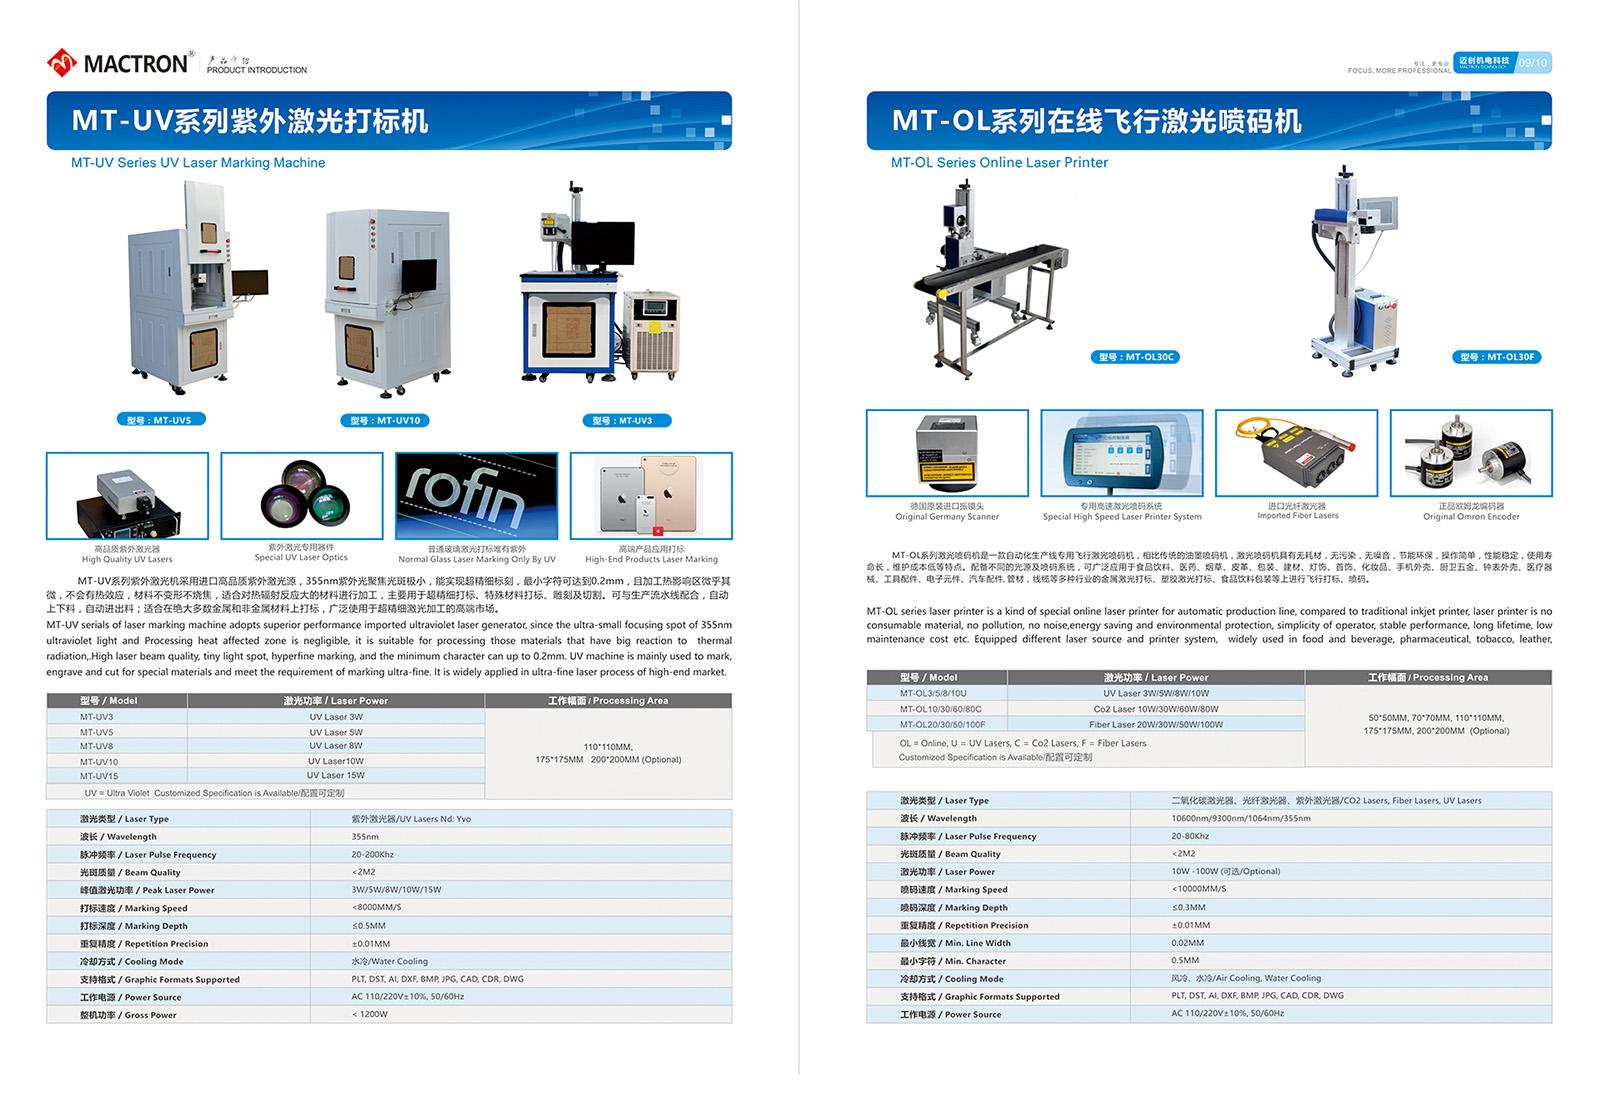 Mactron Tech Laser Catalogue 2017 (6)